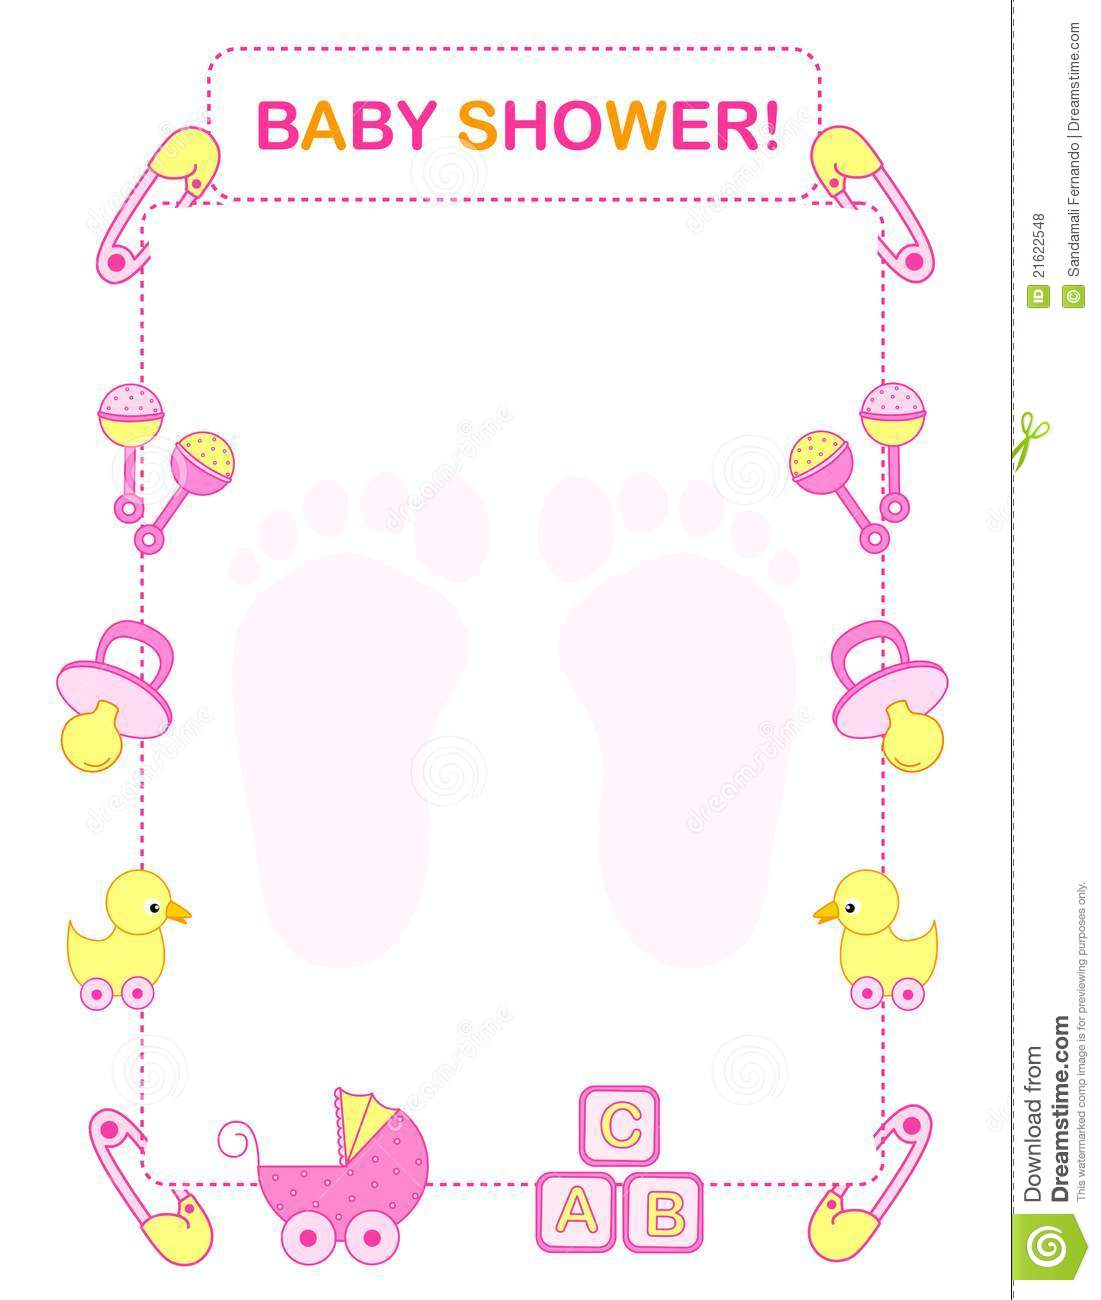 Baby Shower Border Clip Art Free.